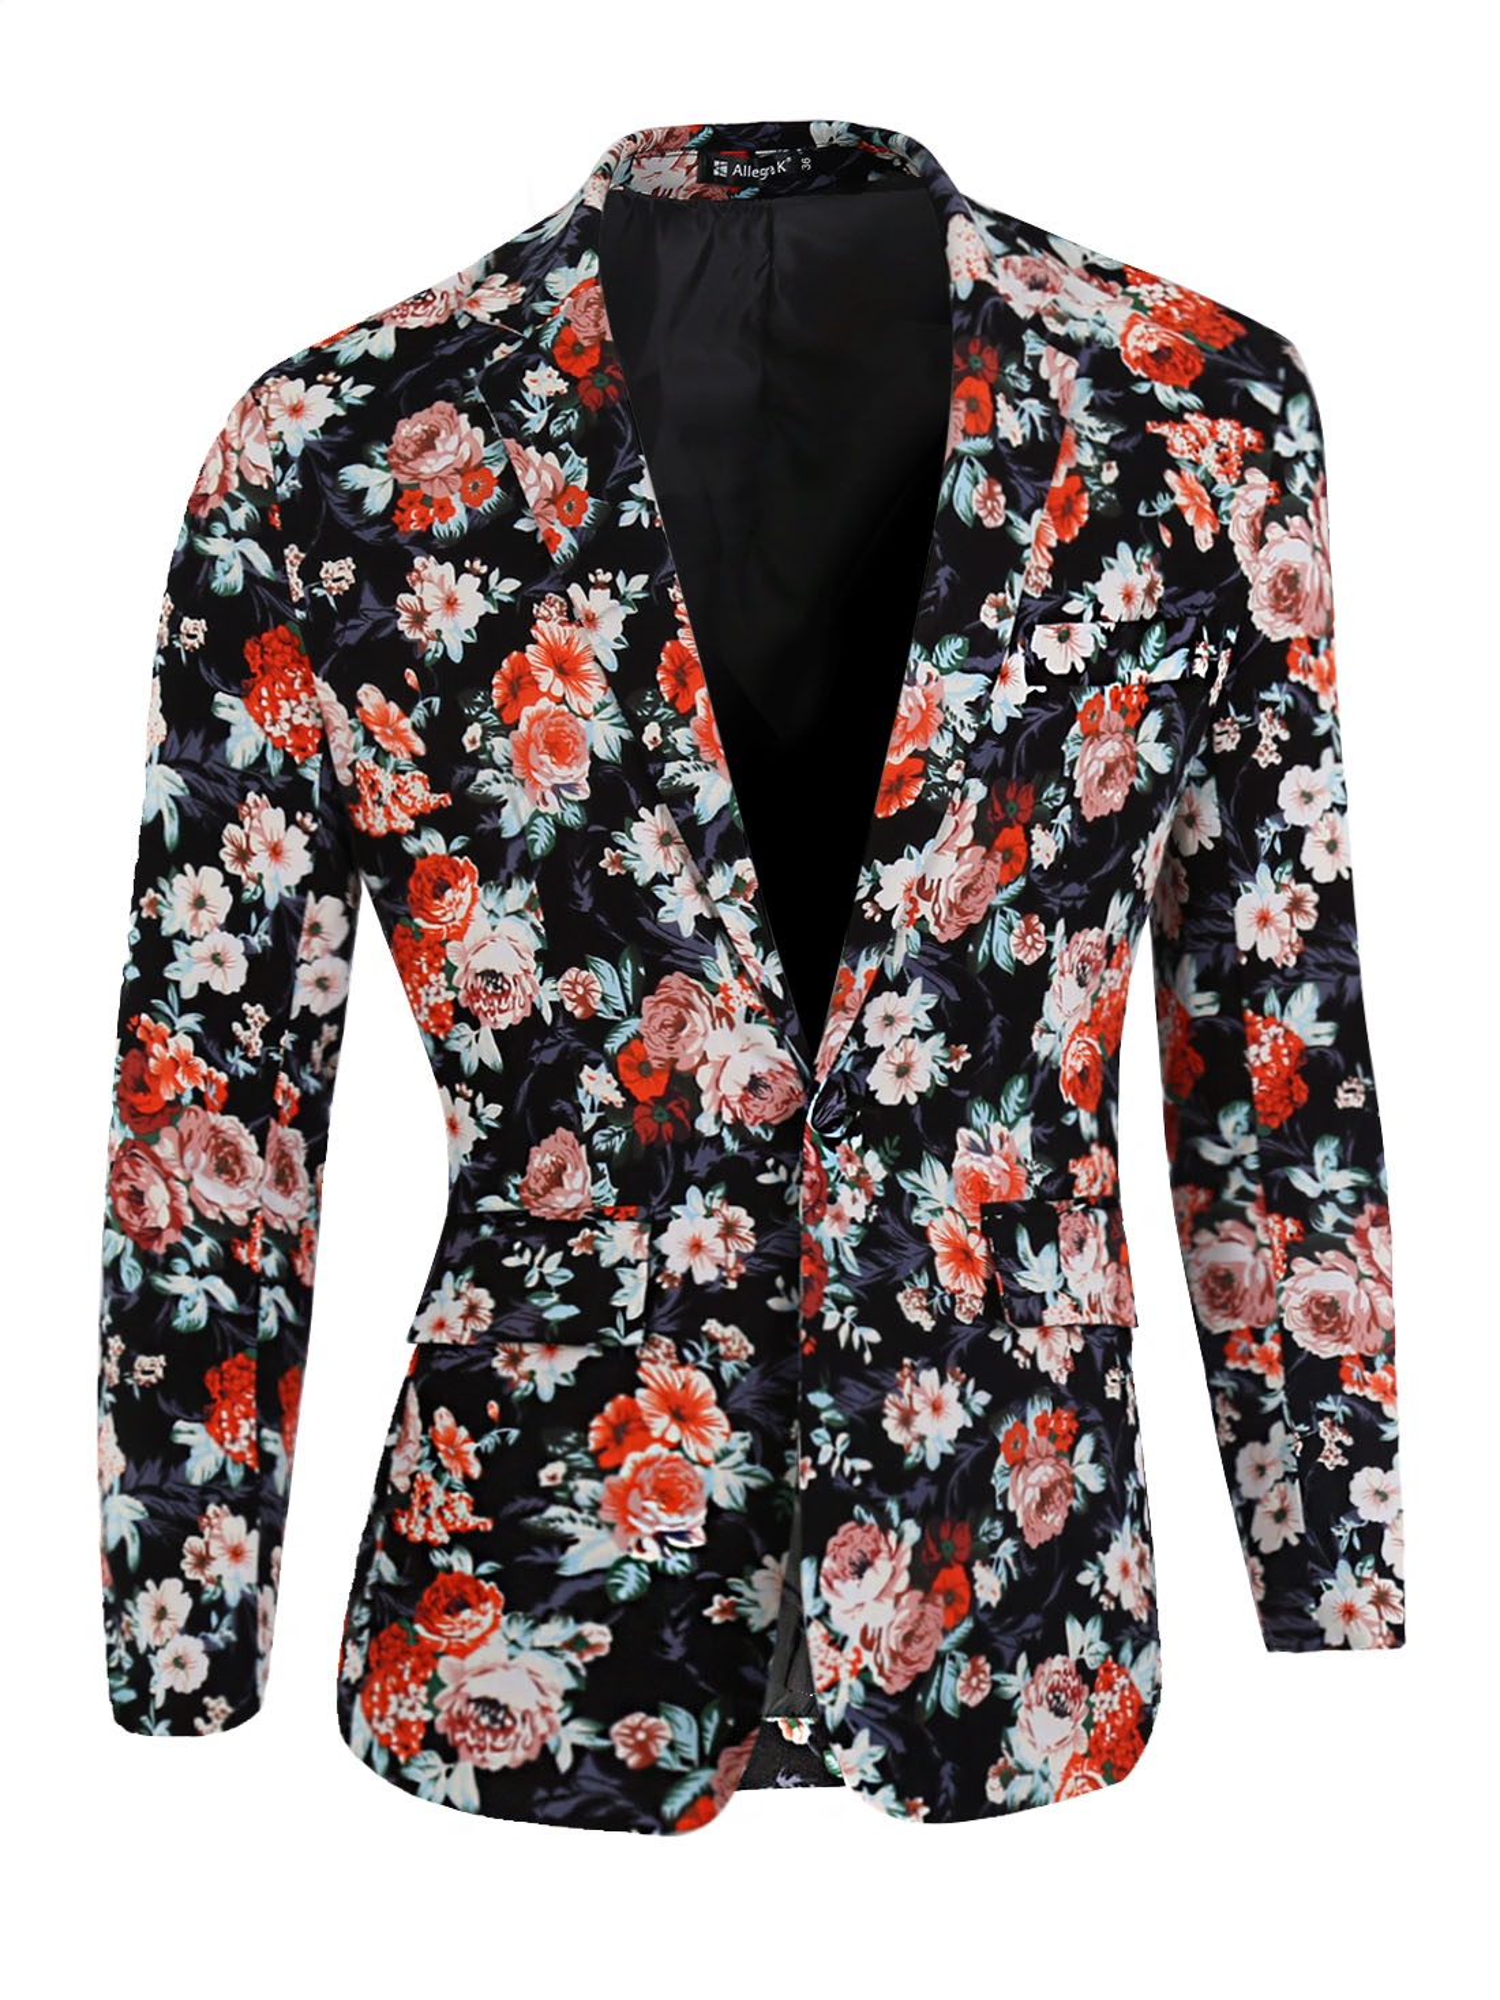 Men's Prom Floral Slim Fit Suit Blazer Jacket Black Coral Pale Pink 42